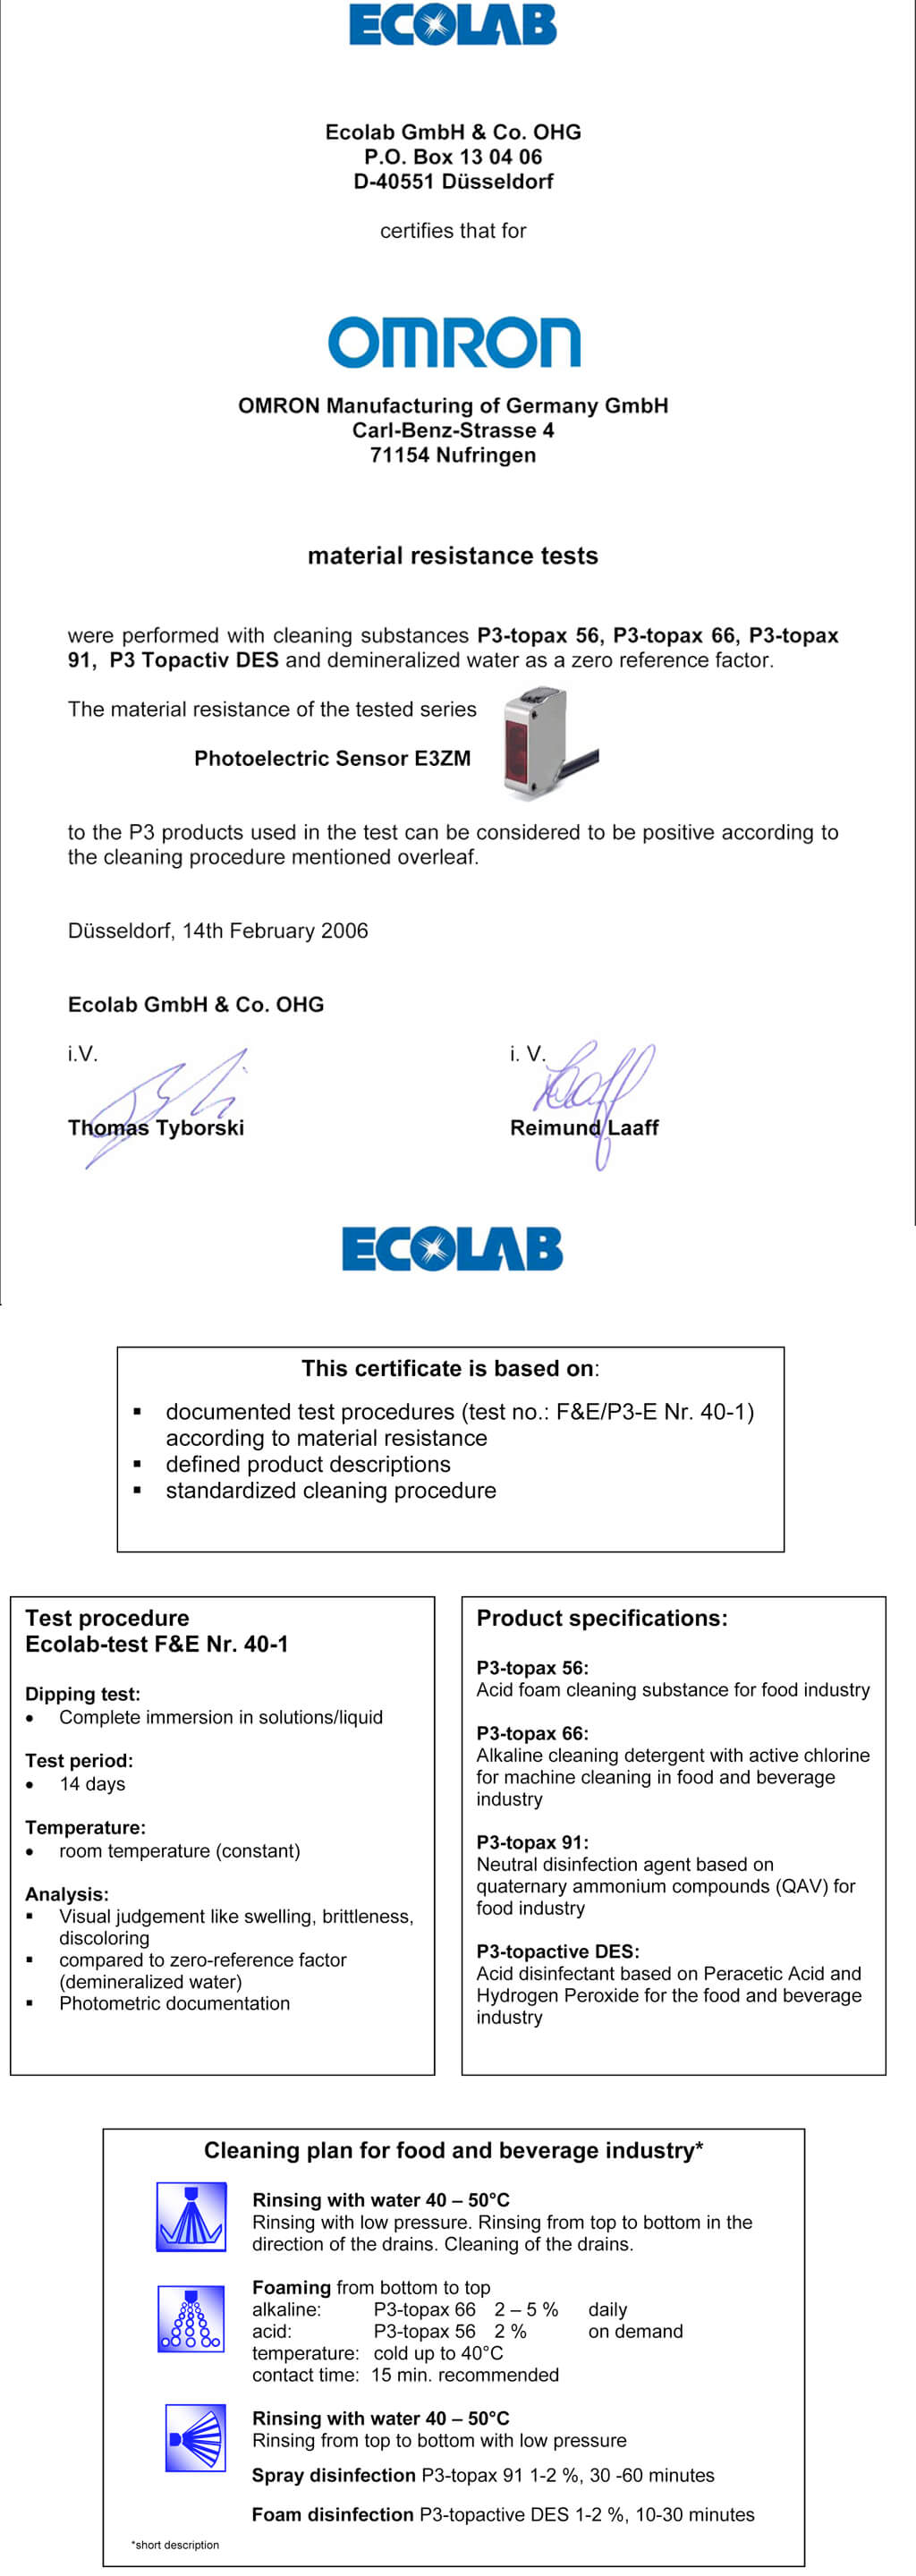 e3zm ecolab-2 prod